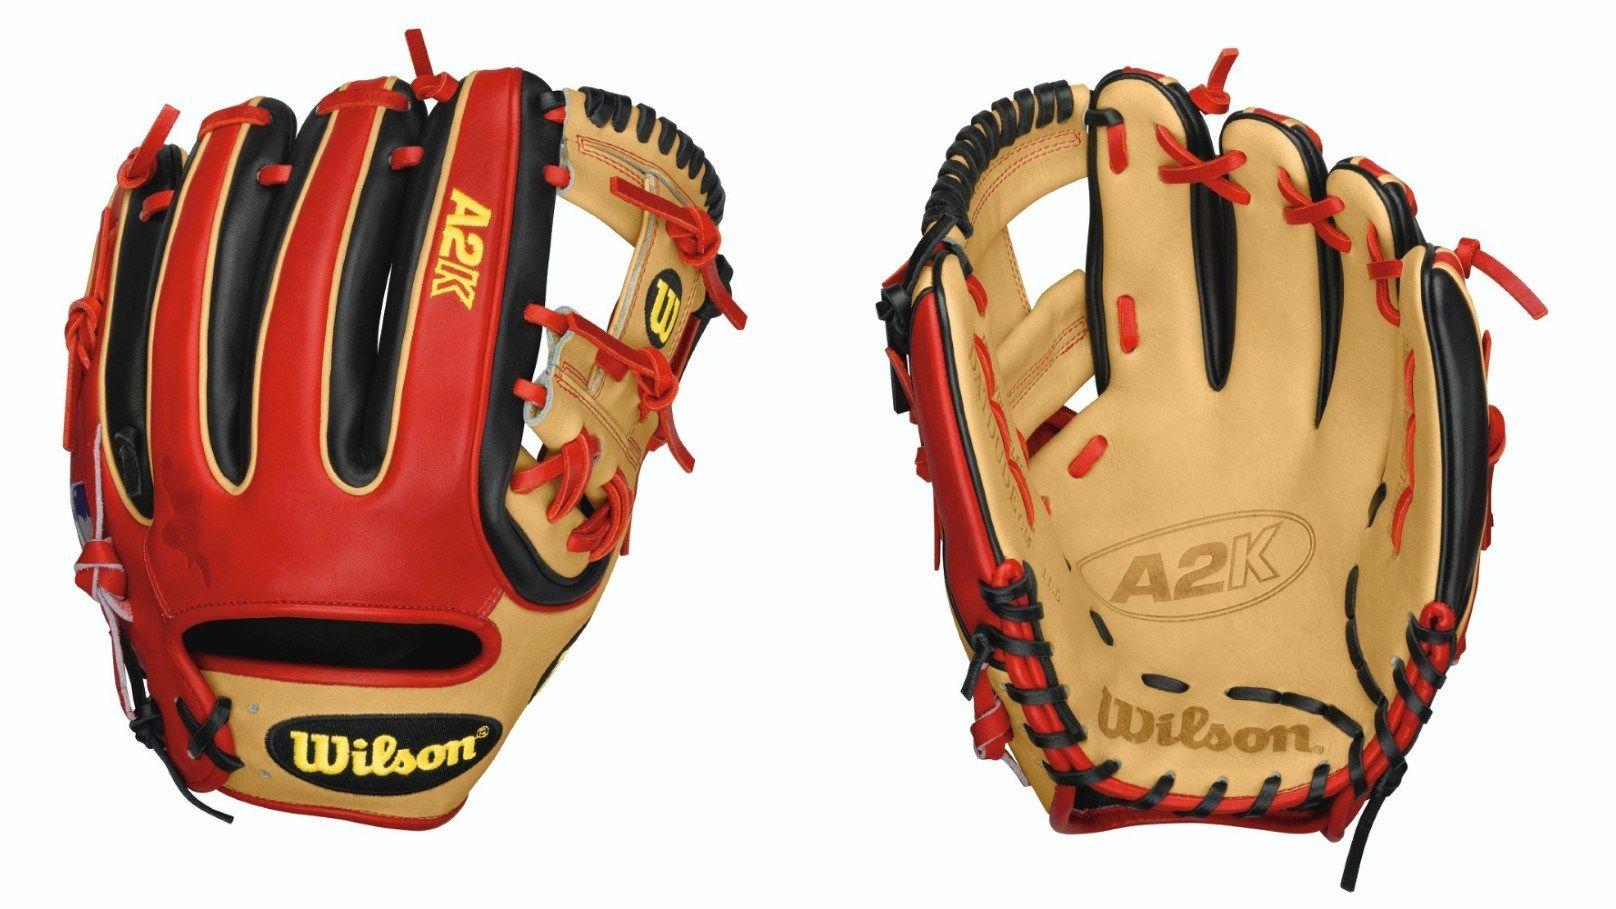 2015 Wilson A2k Datdude Baseball Glove Brandon Phillips Black And Red